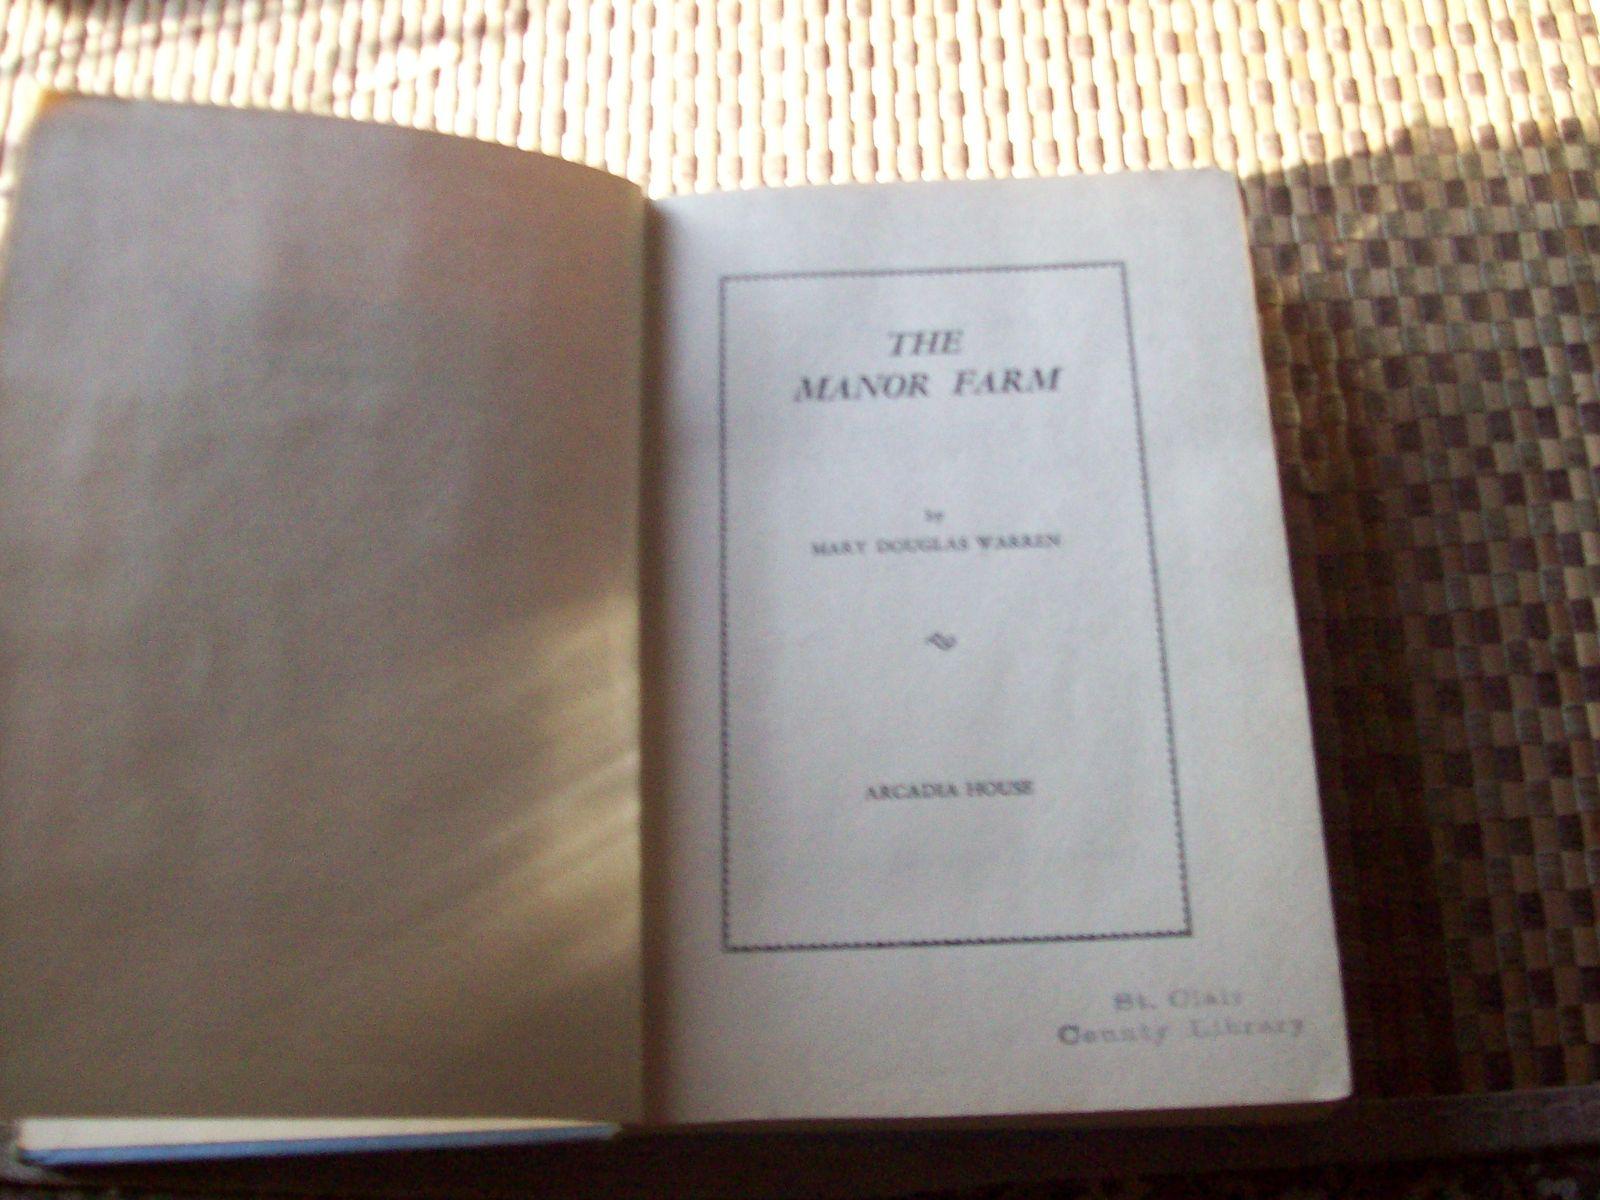 The Manor Farm by Mary Douglas Warren 1951 HB Arcadia House